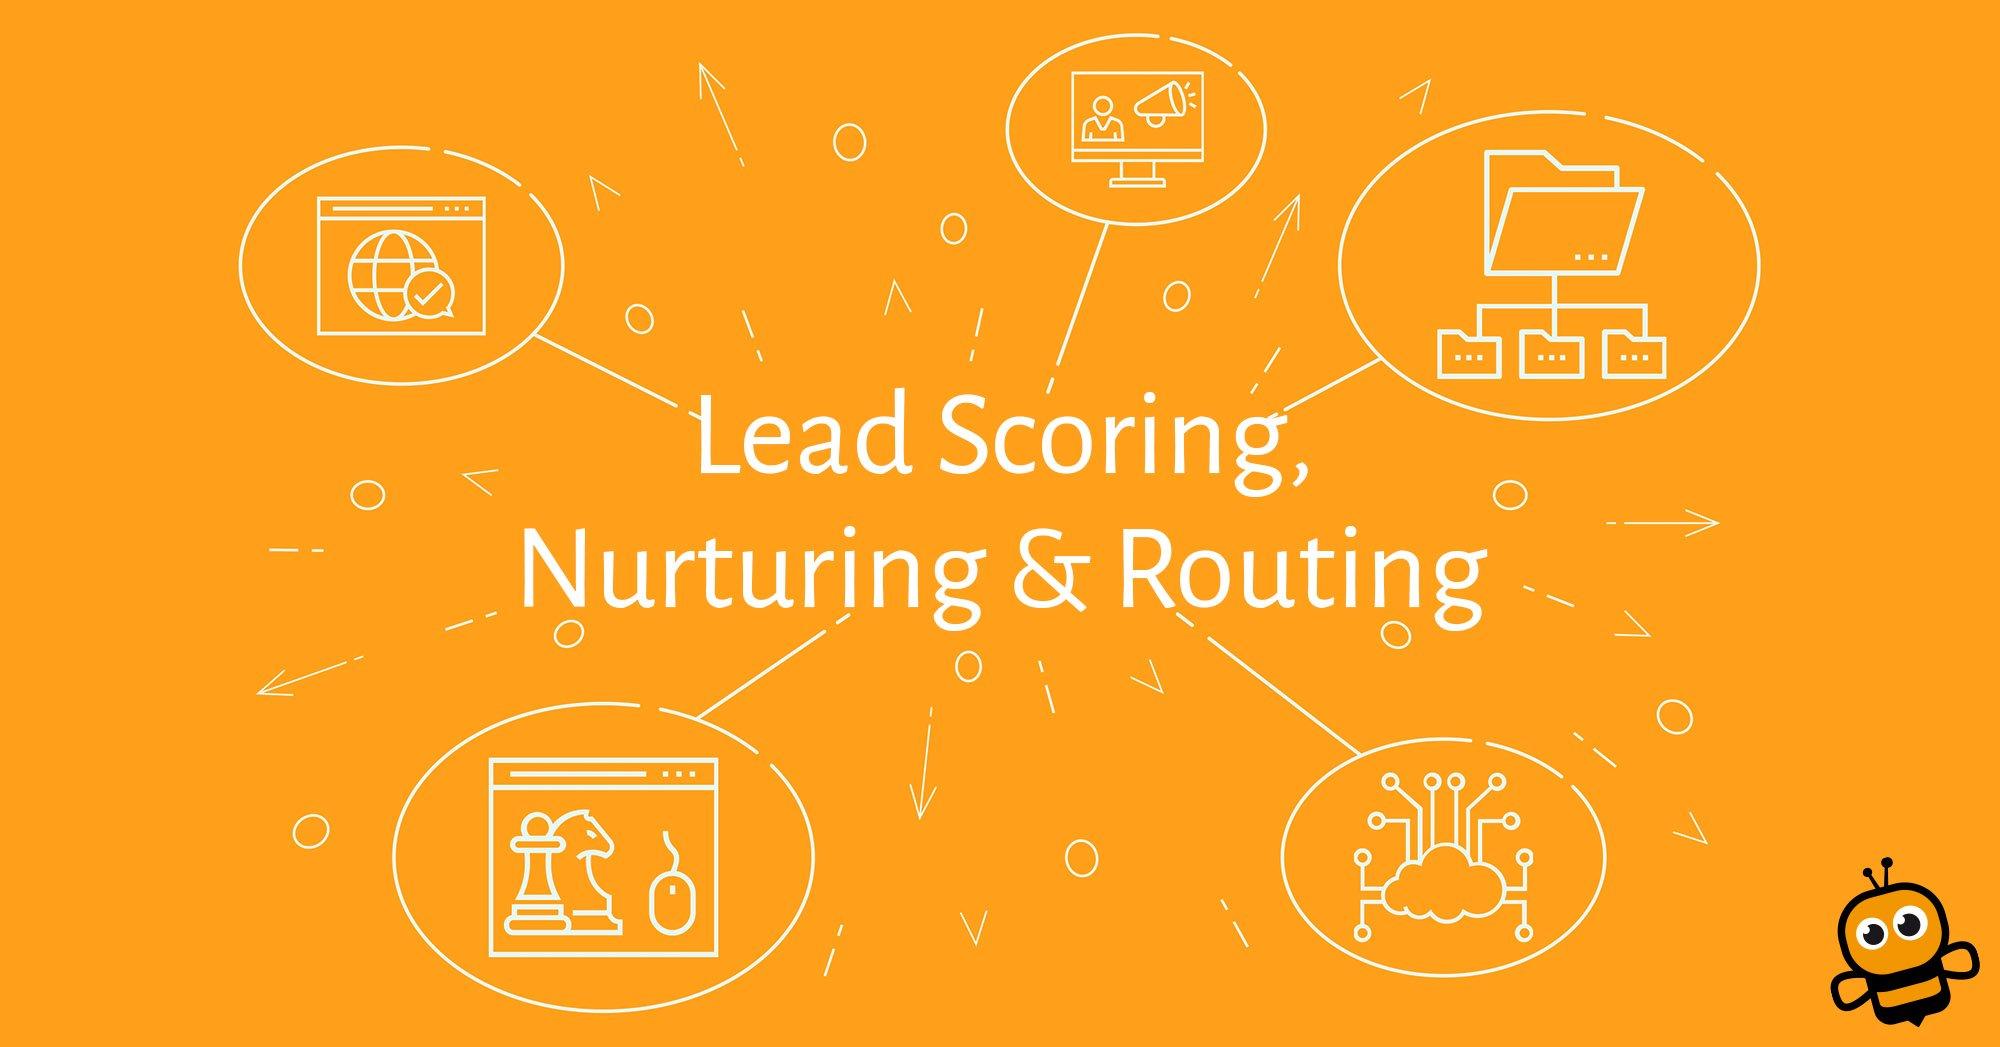 leadscoringnurturing